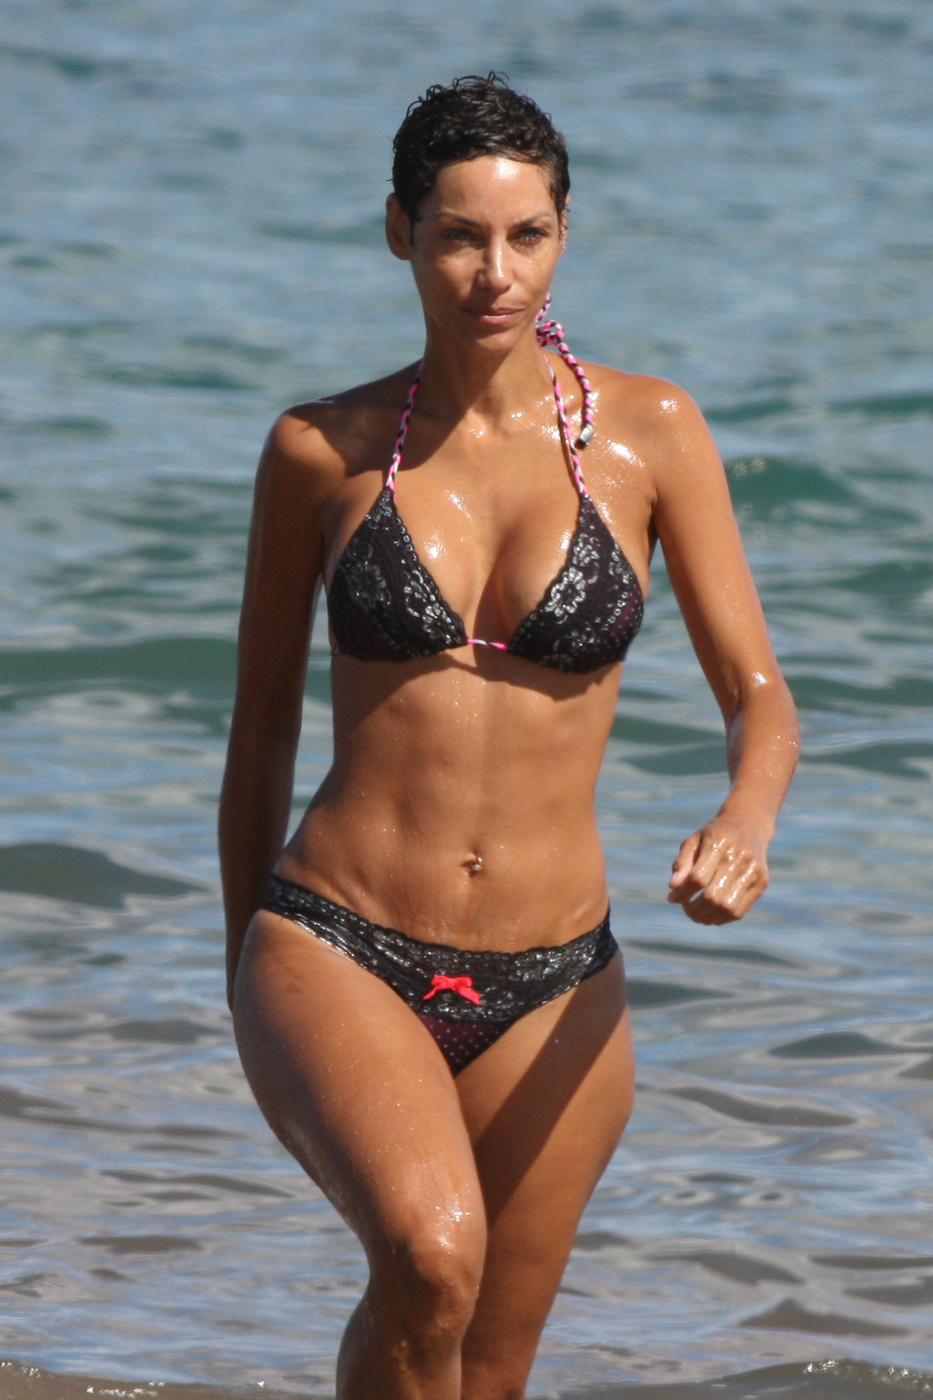 Allie Ayers Nude nicole murphy in a bikini paddleboarding at the beach